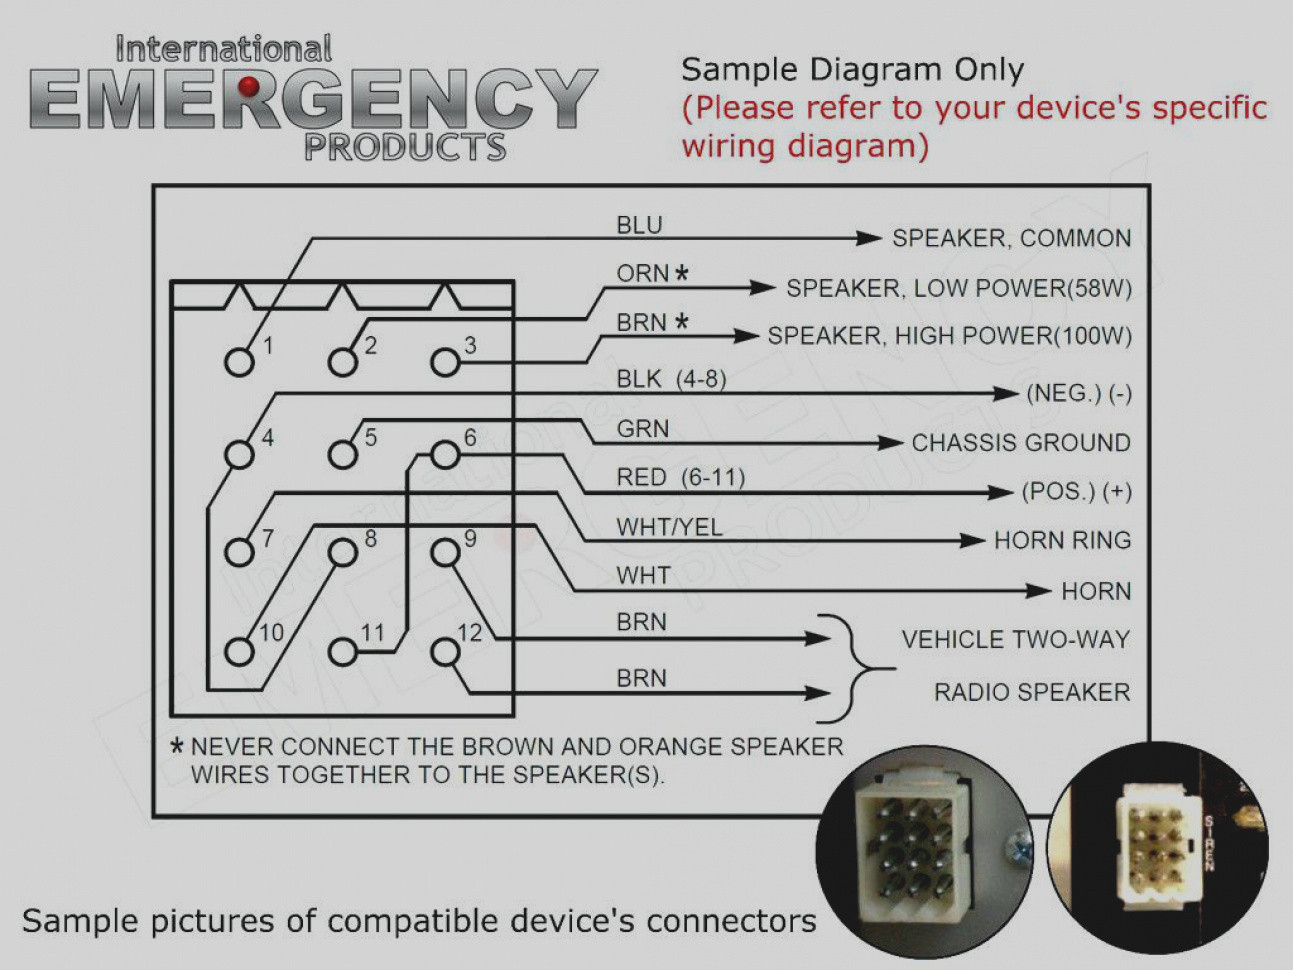 Federal Siren Wiring Diagram | Wiring Diagram - Federal Signal Pa300 Wiring Diagram